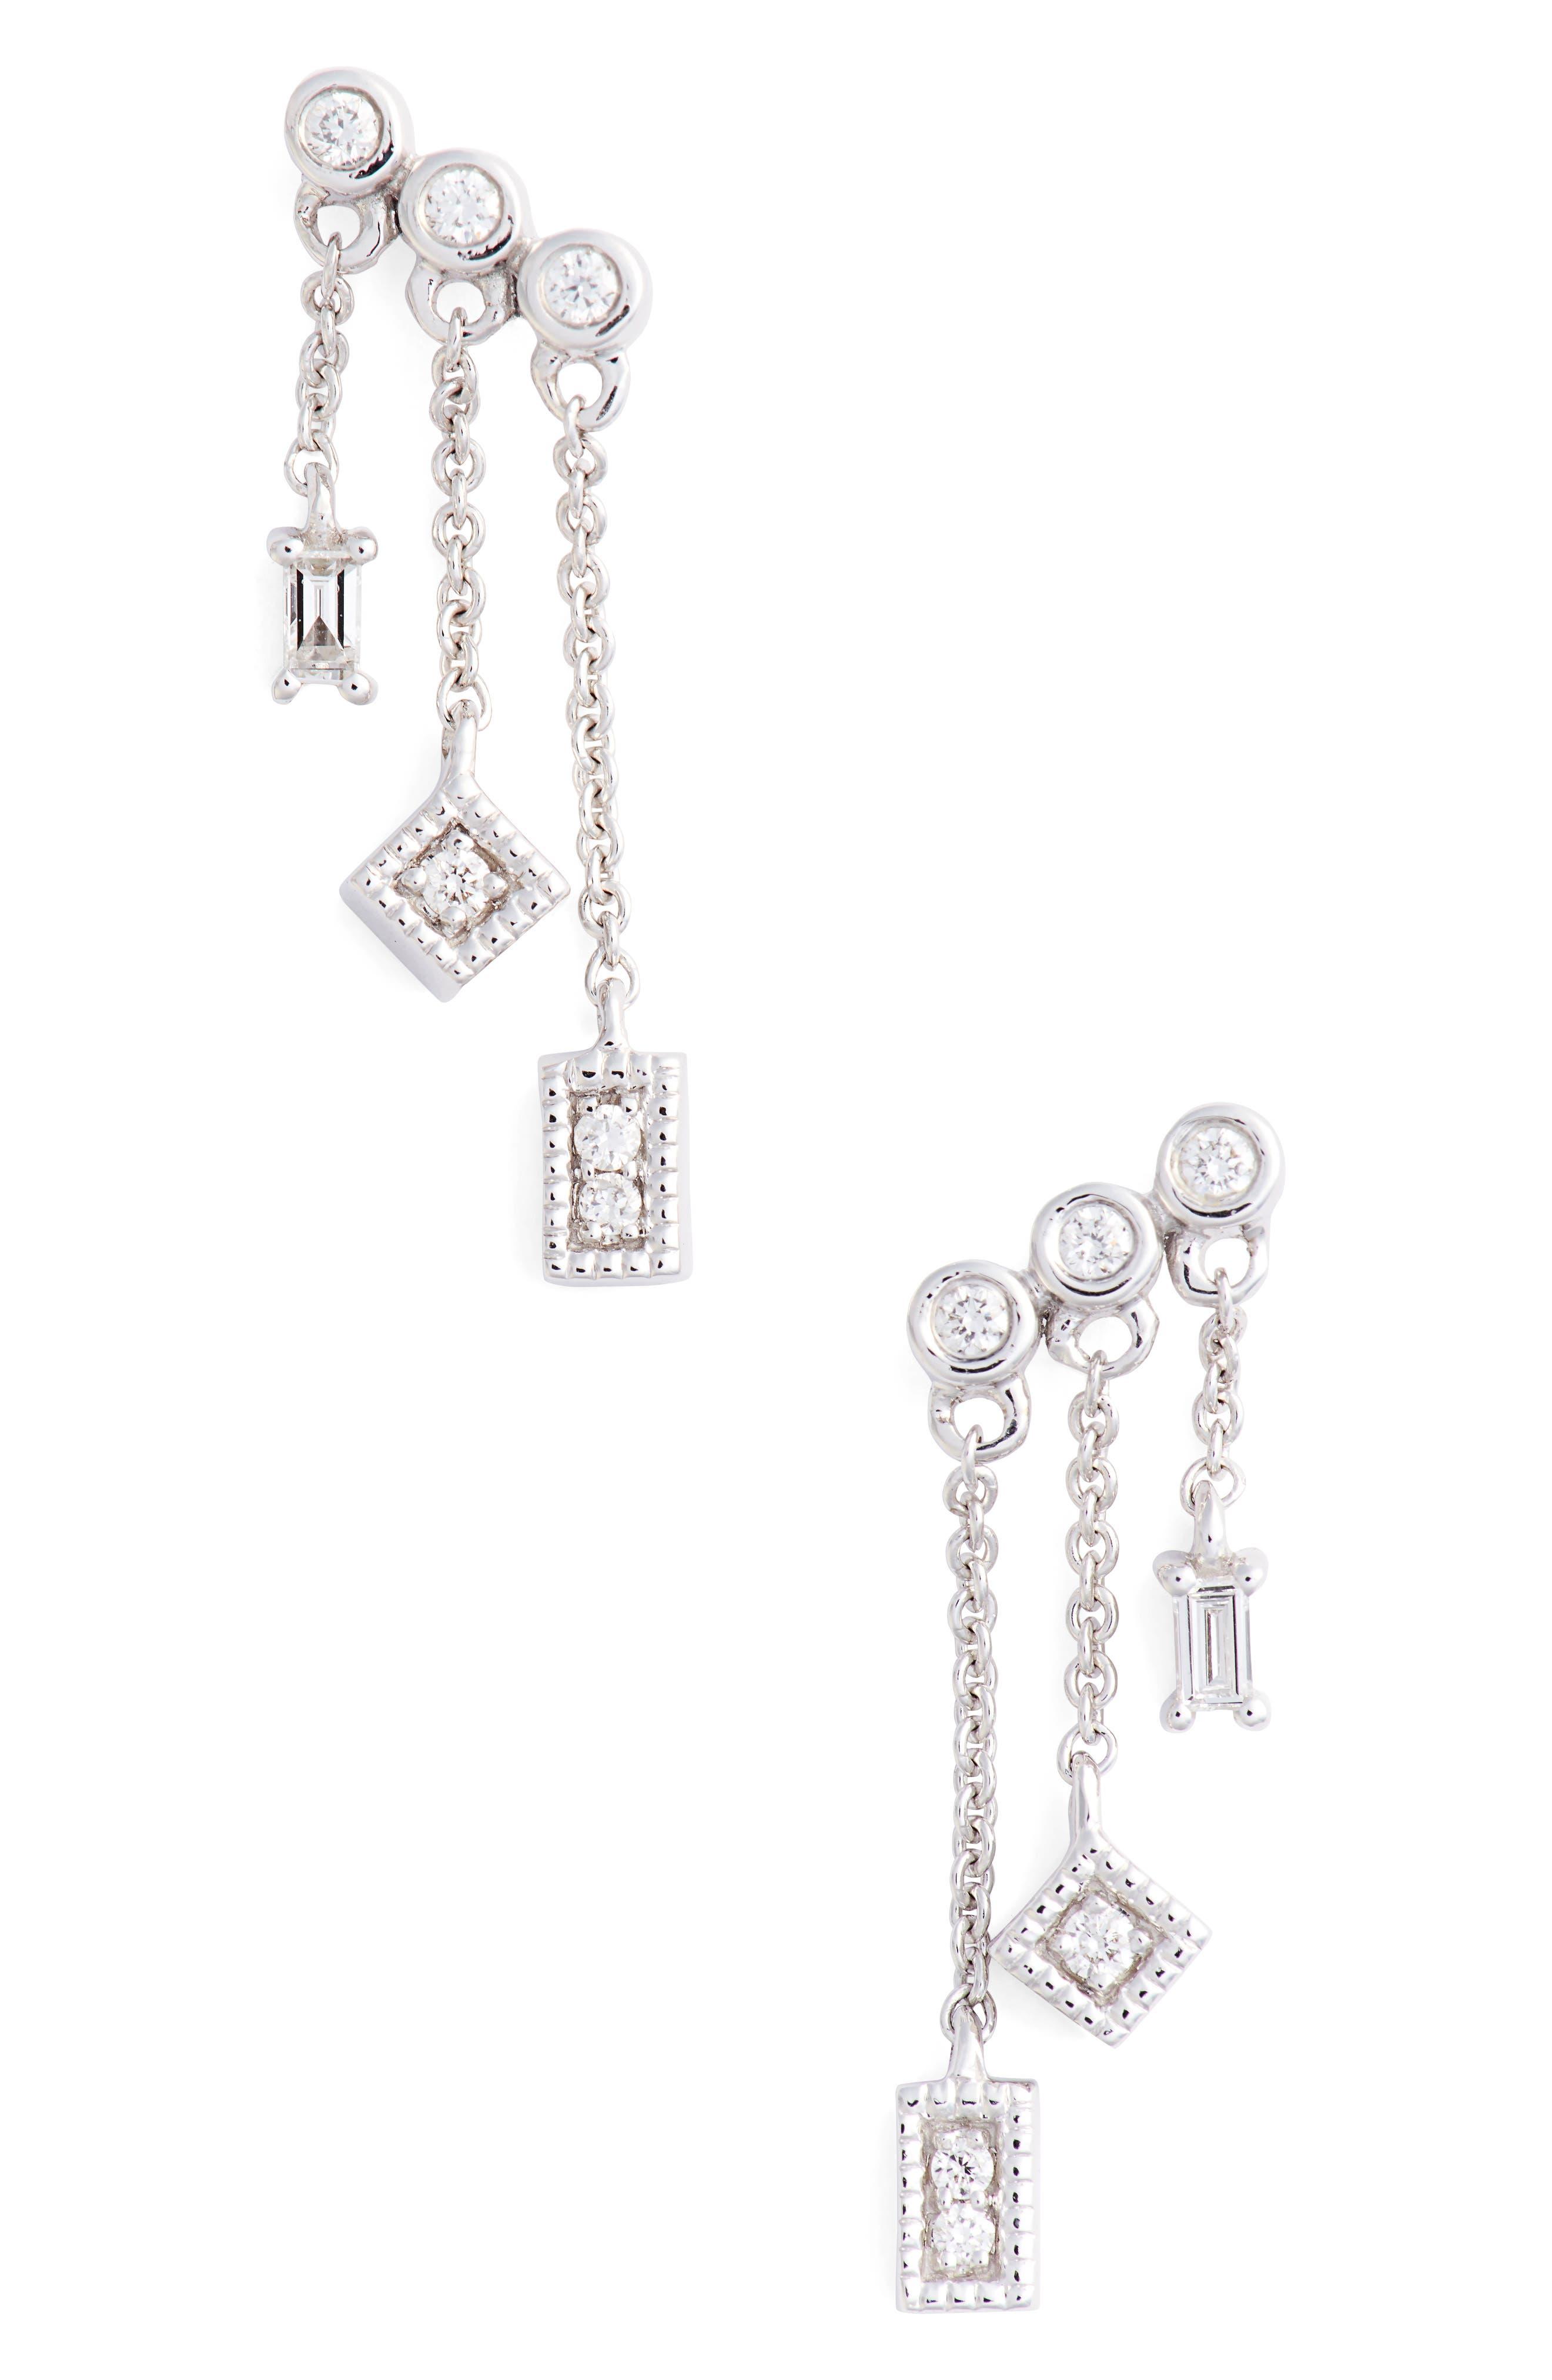 Main Image - Dana Rebecca Designs Lisa Michelle Diamond Drop Earrings